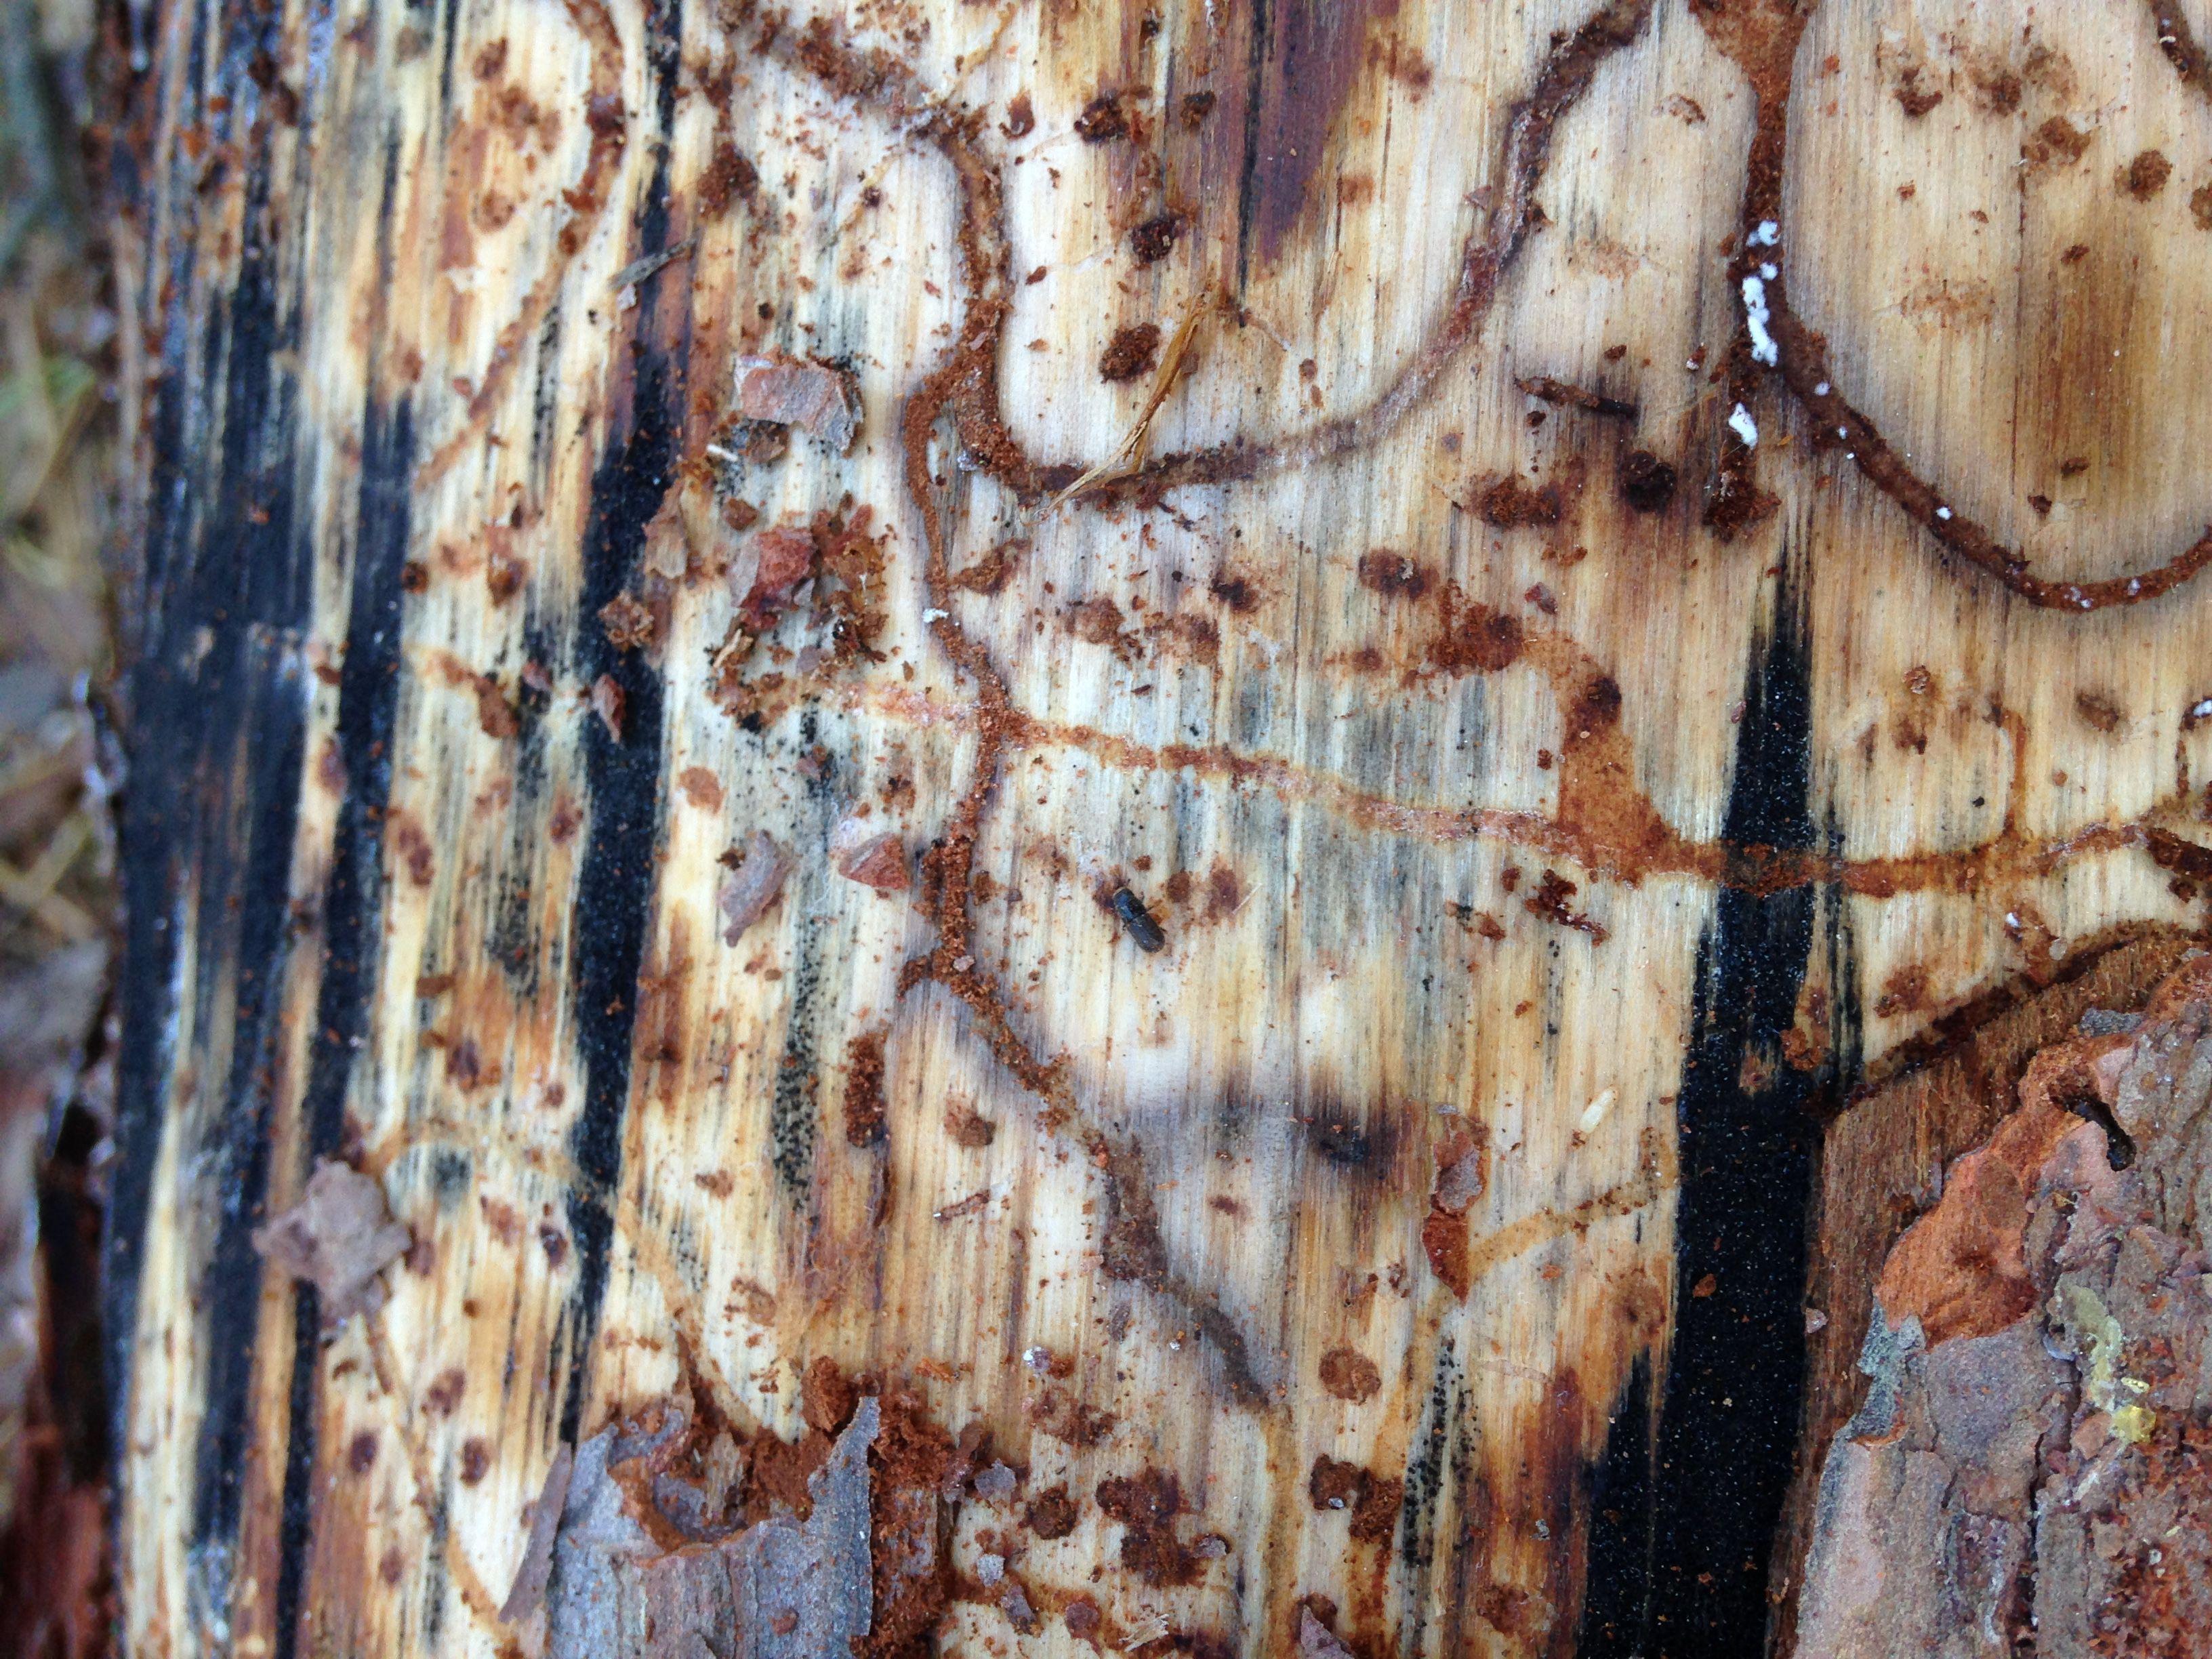 southern pine beetle tree damage